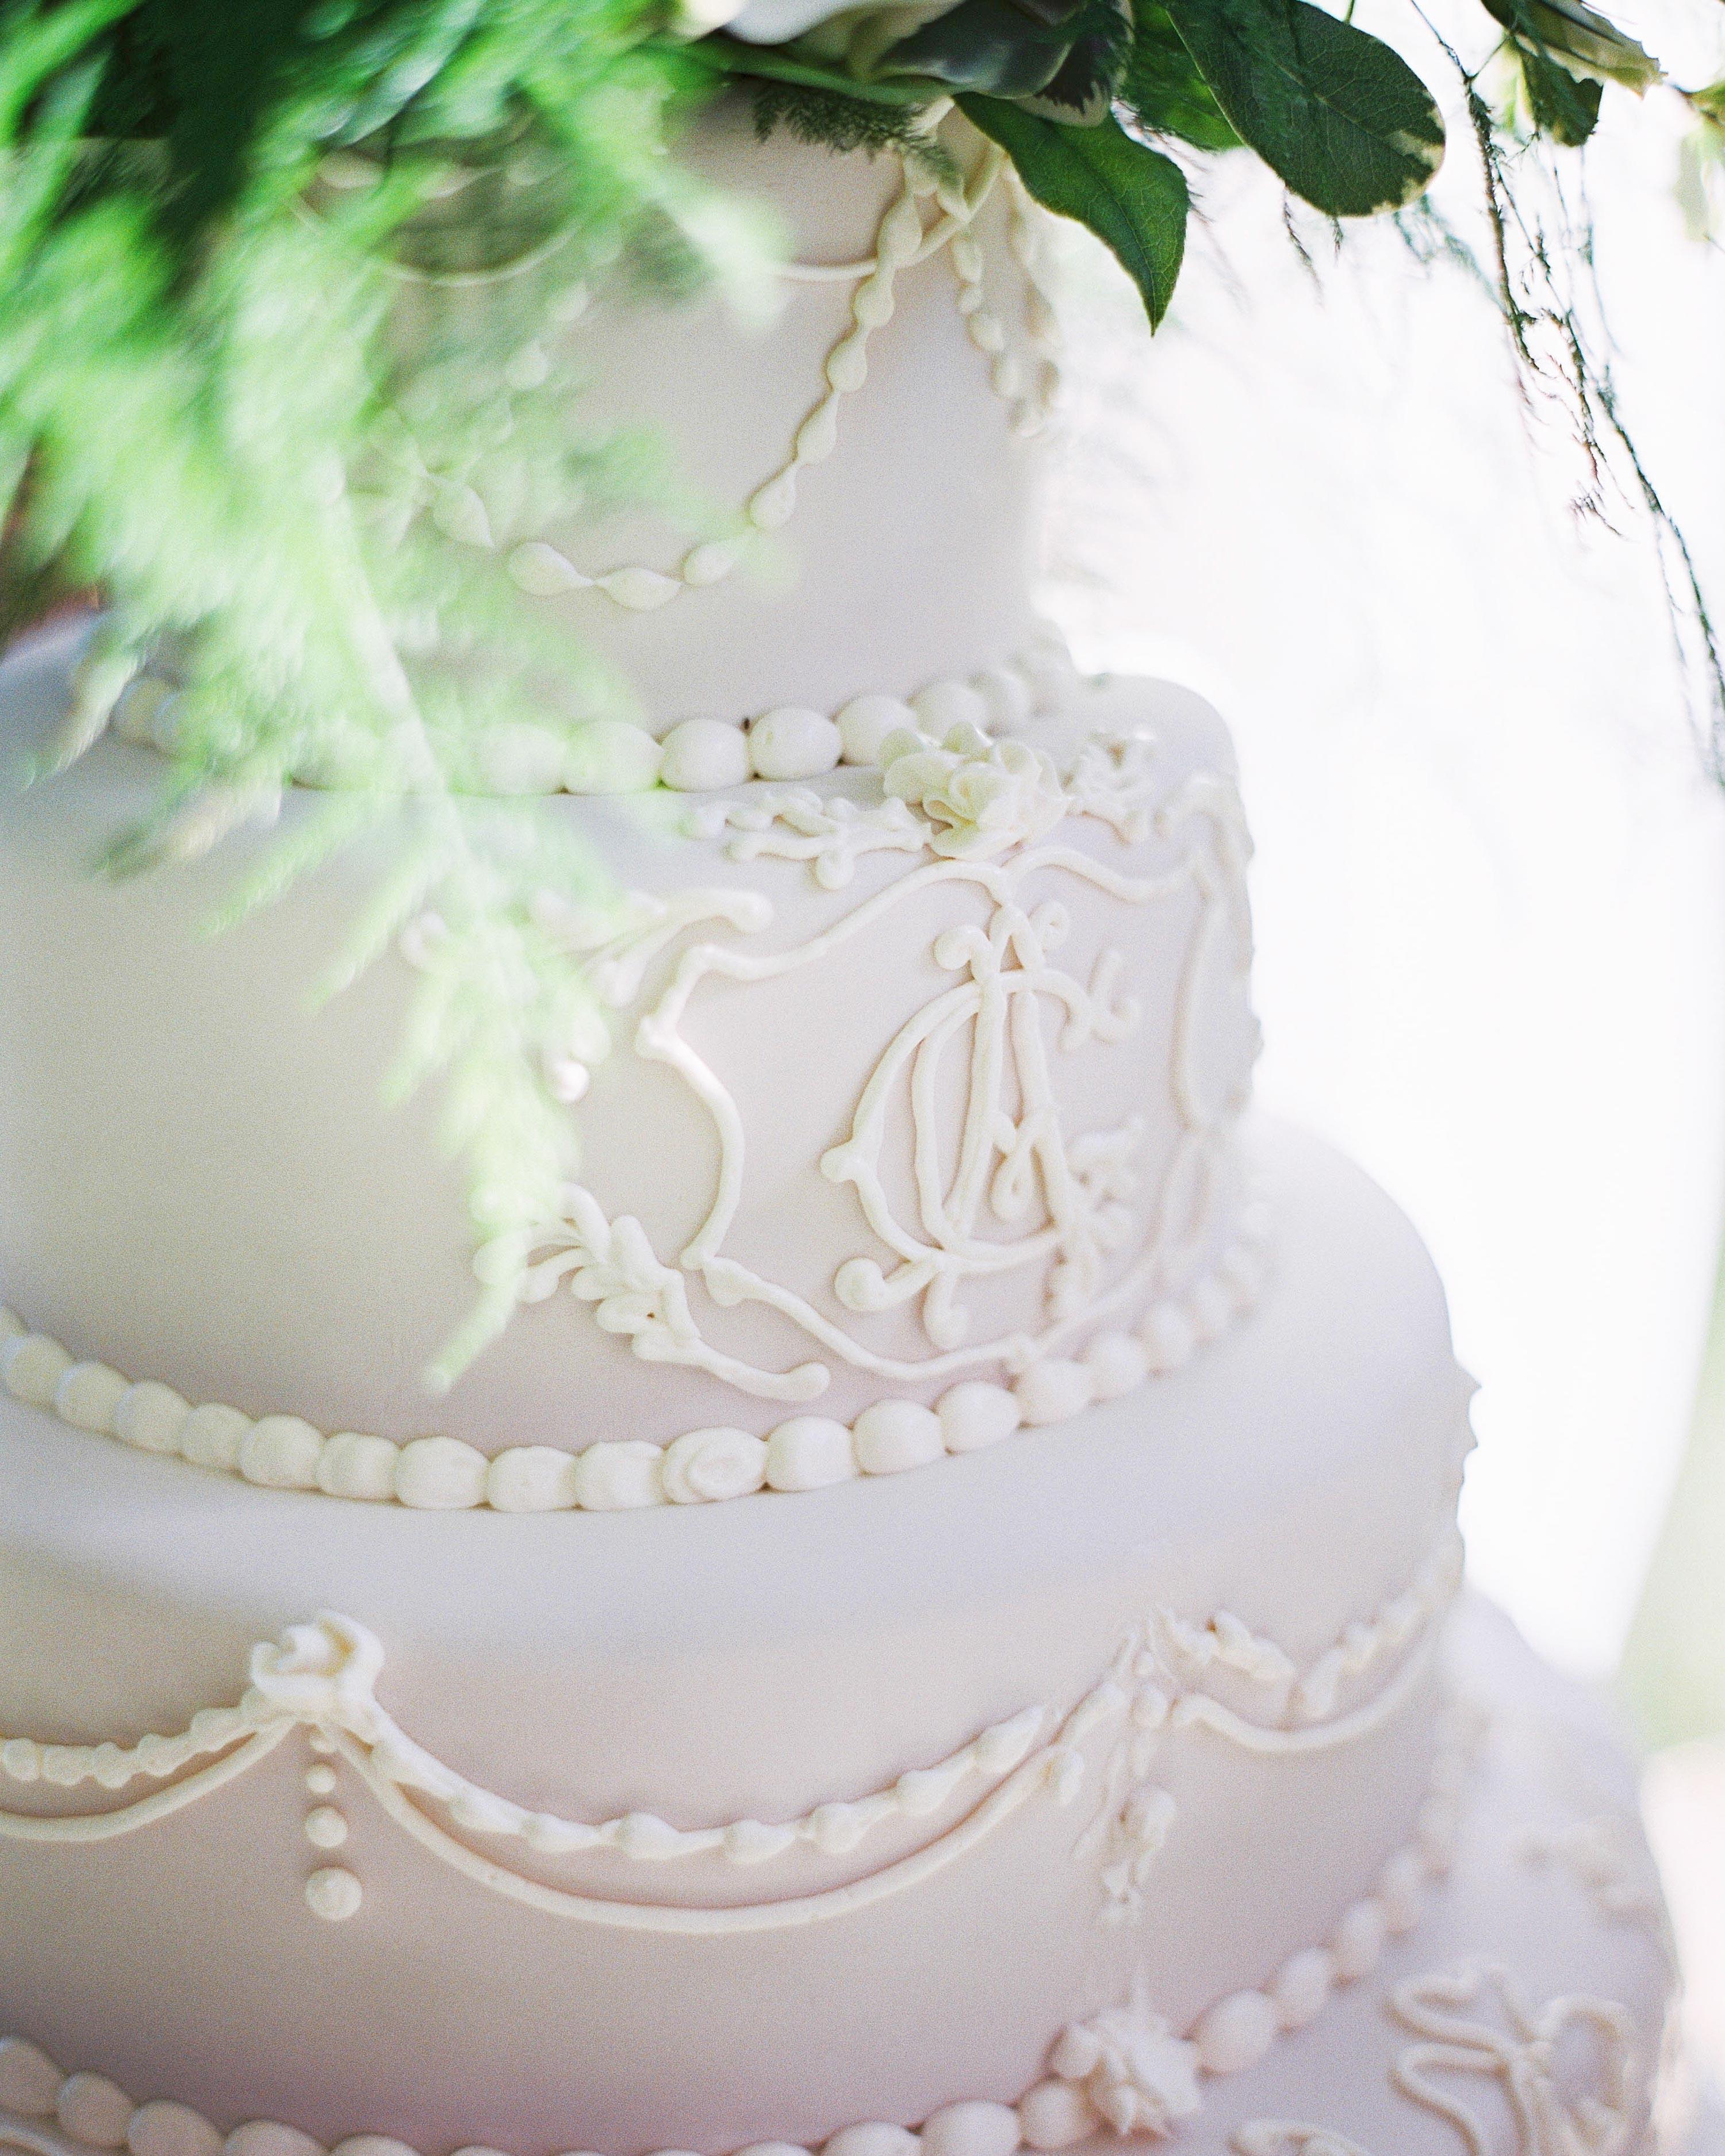 amy-garrison-wedding-cake-00718-6134266-0816.jpg